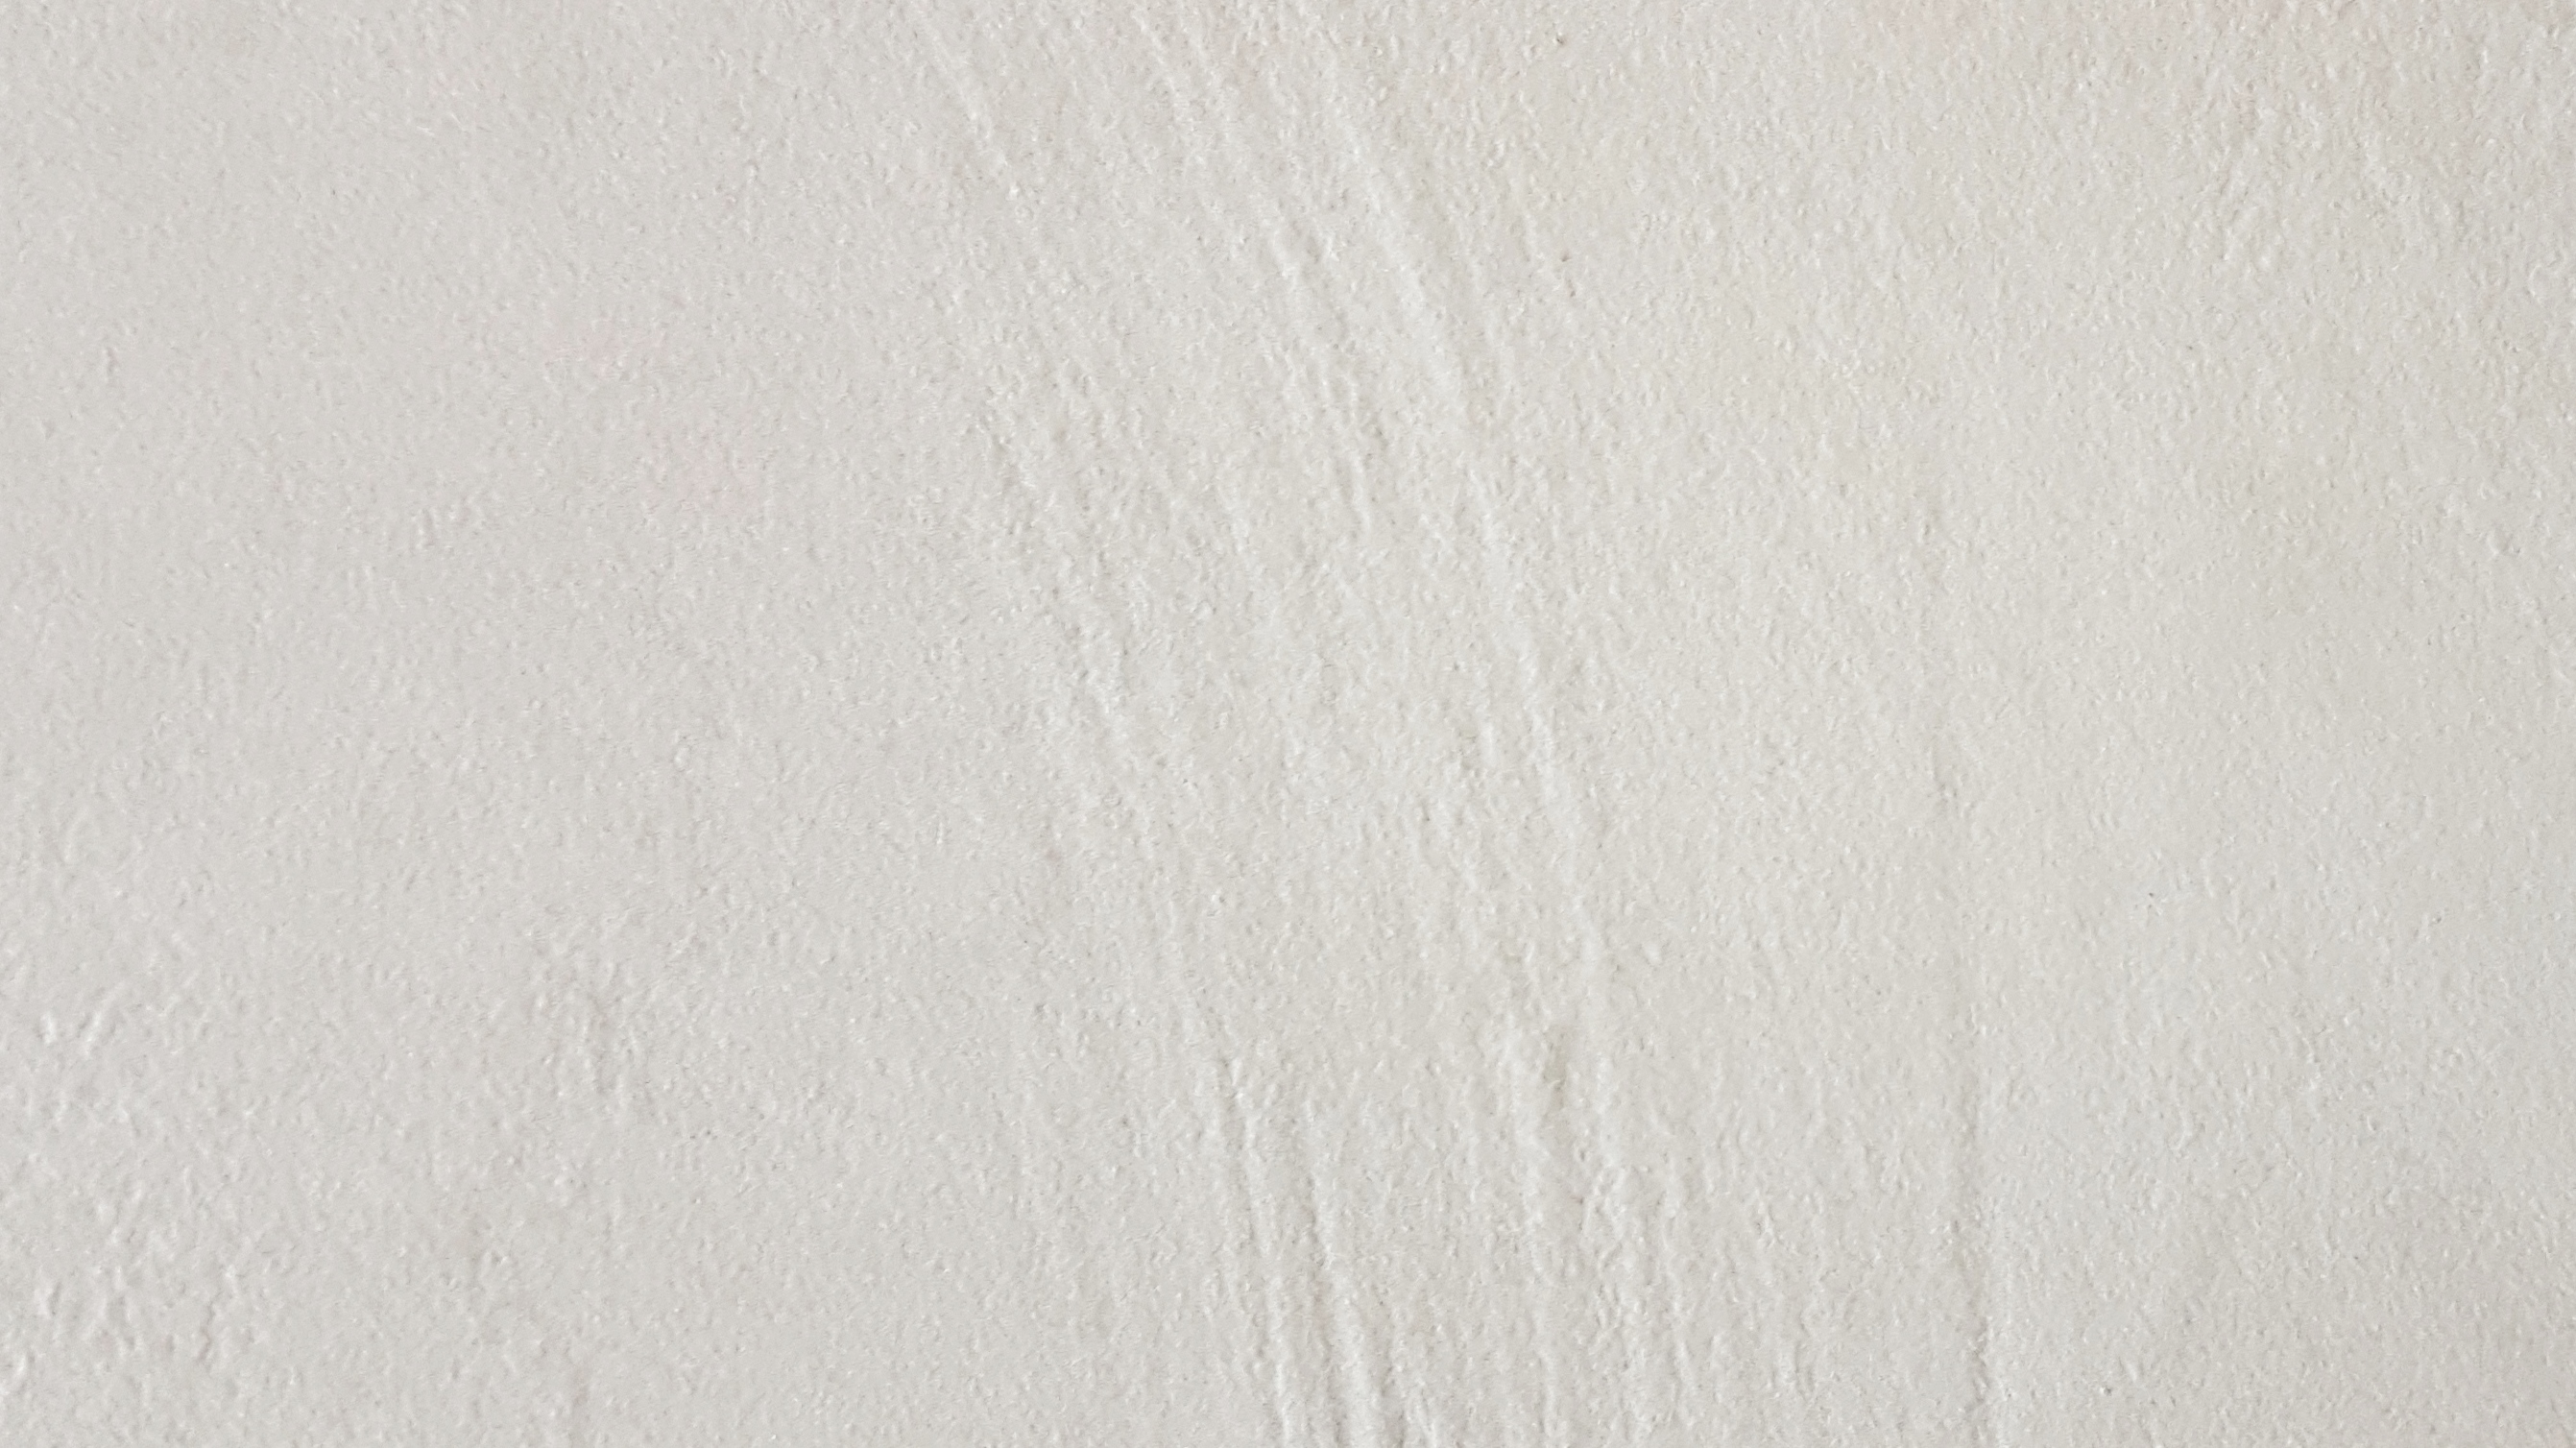 Béton ciré blanc